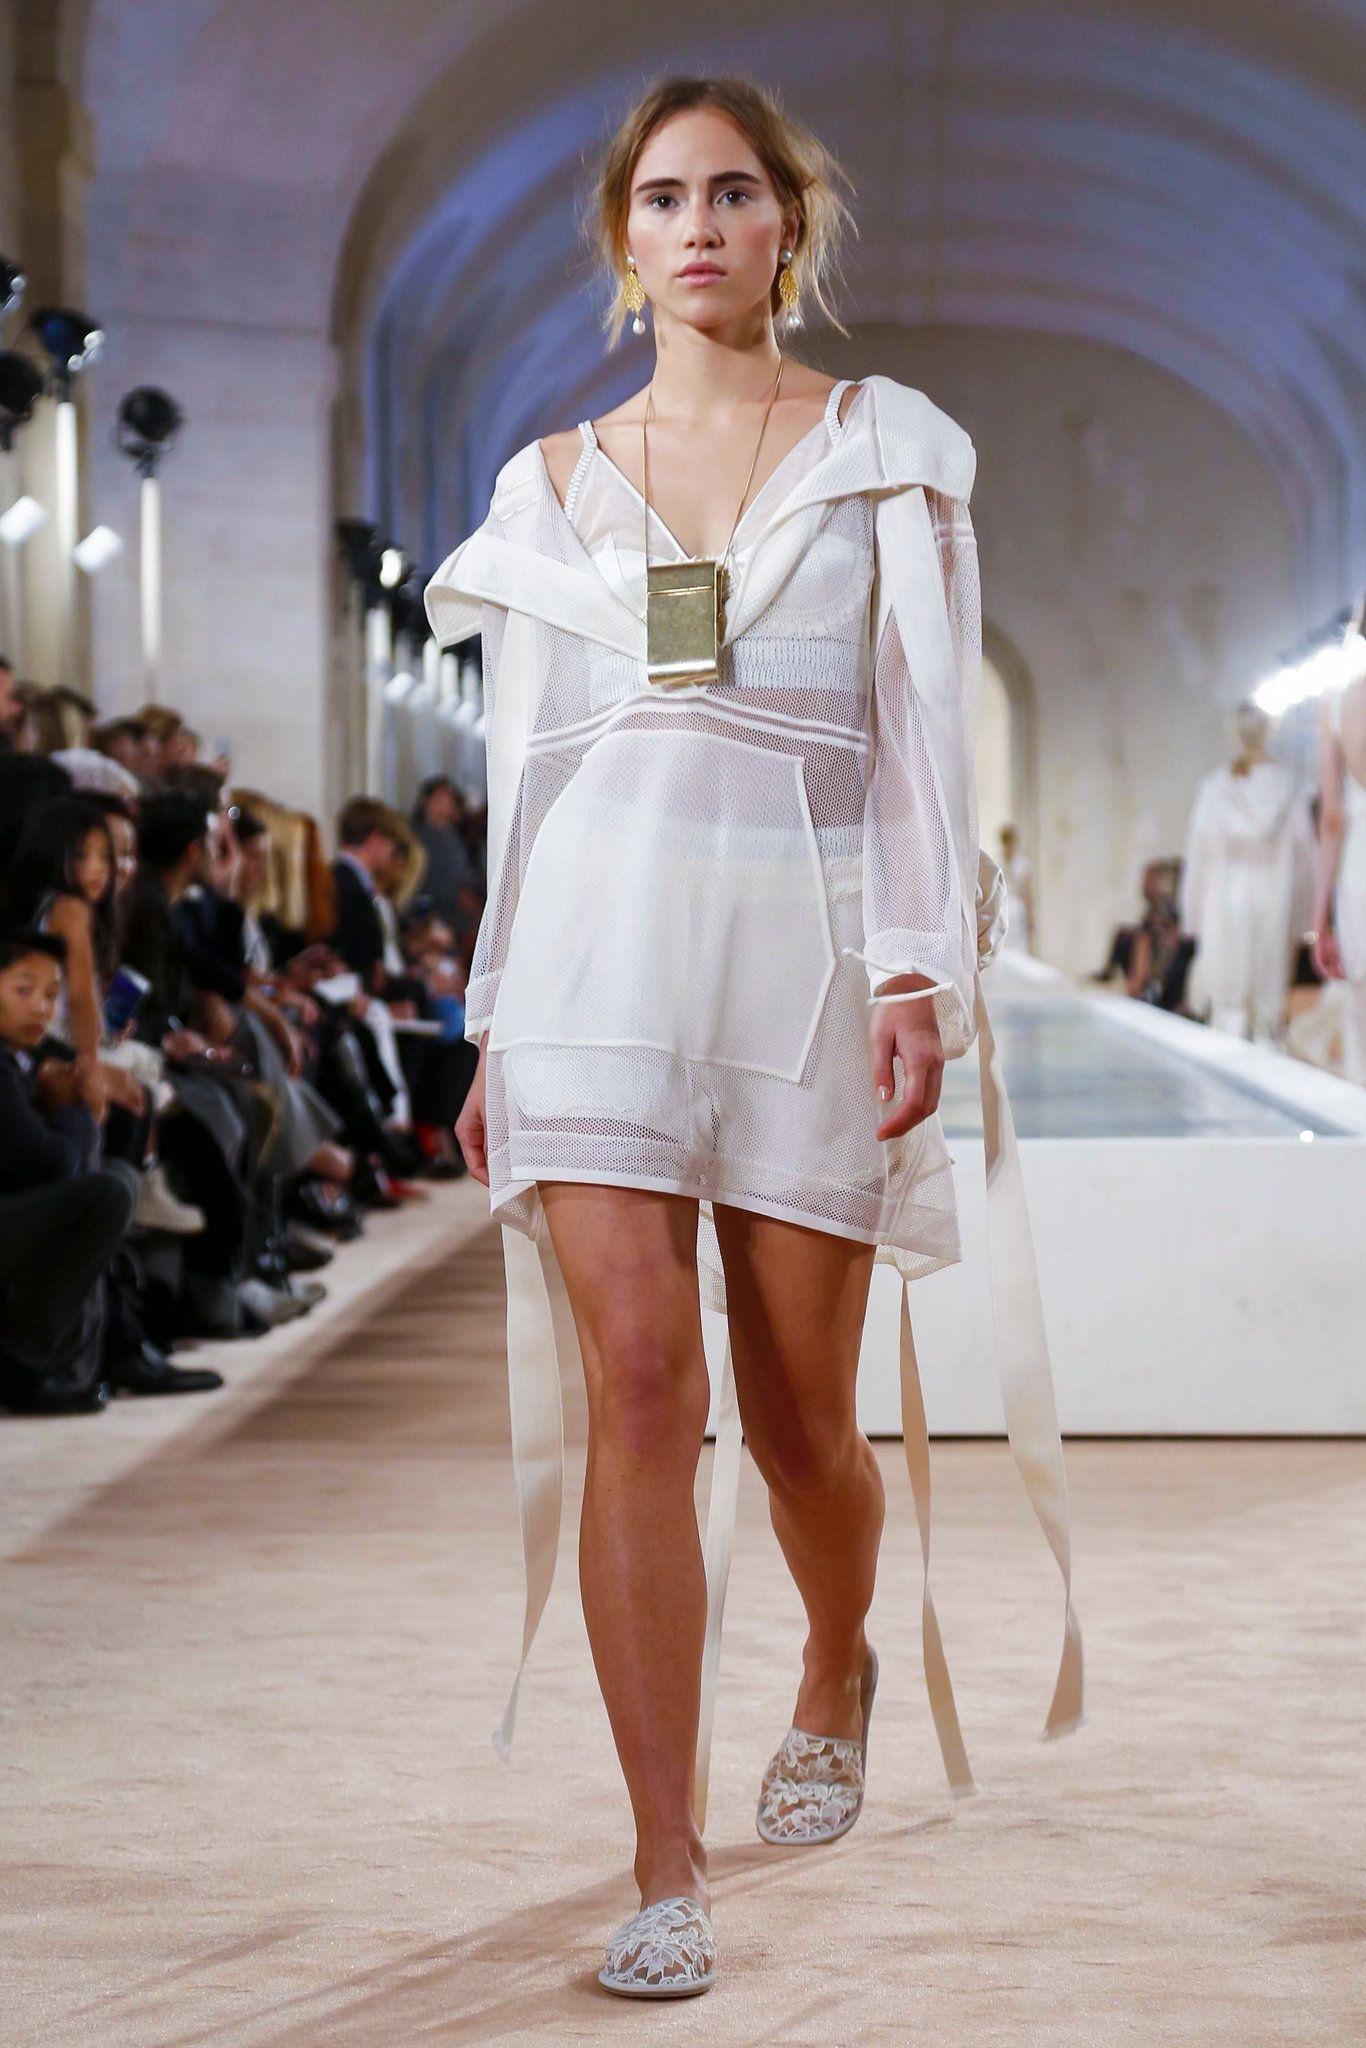 aa85cefbe748 A look from the Balenciaga spring summer 2016 show during Paris Fashion  Week. (Photo  Regis Colin Berthelier Nowfashion)